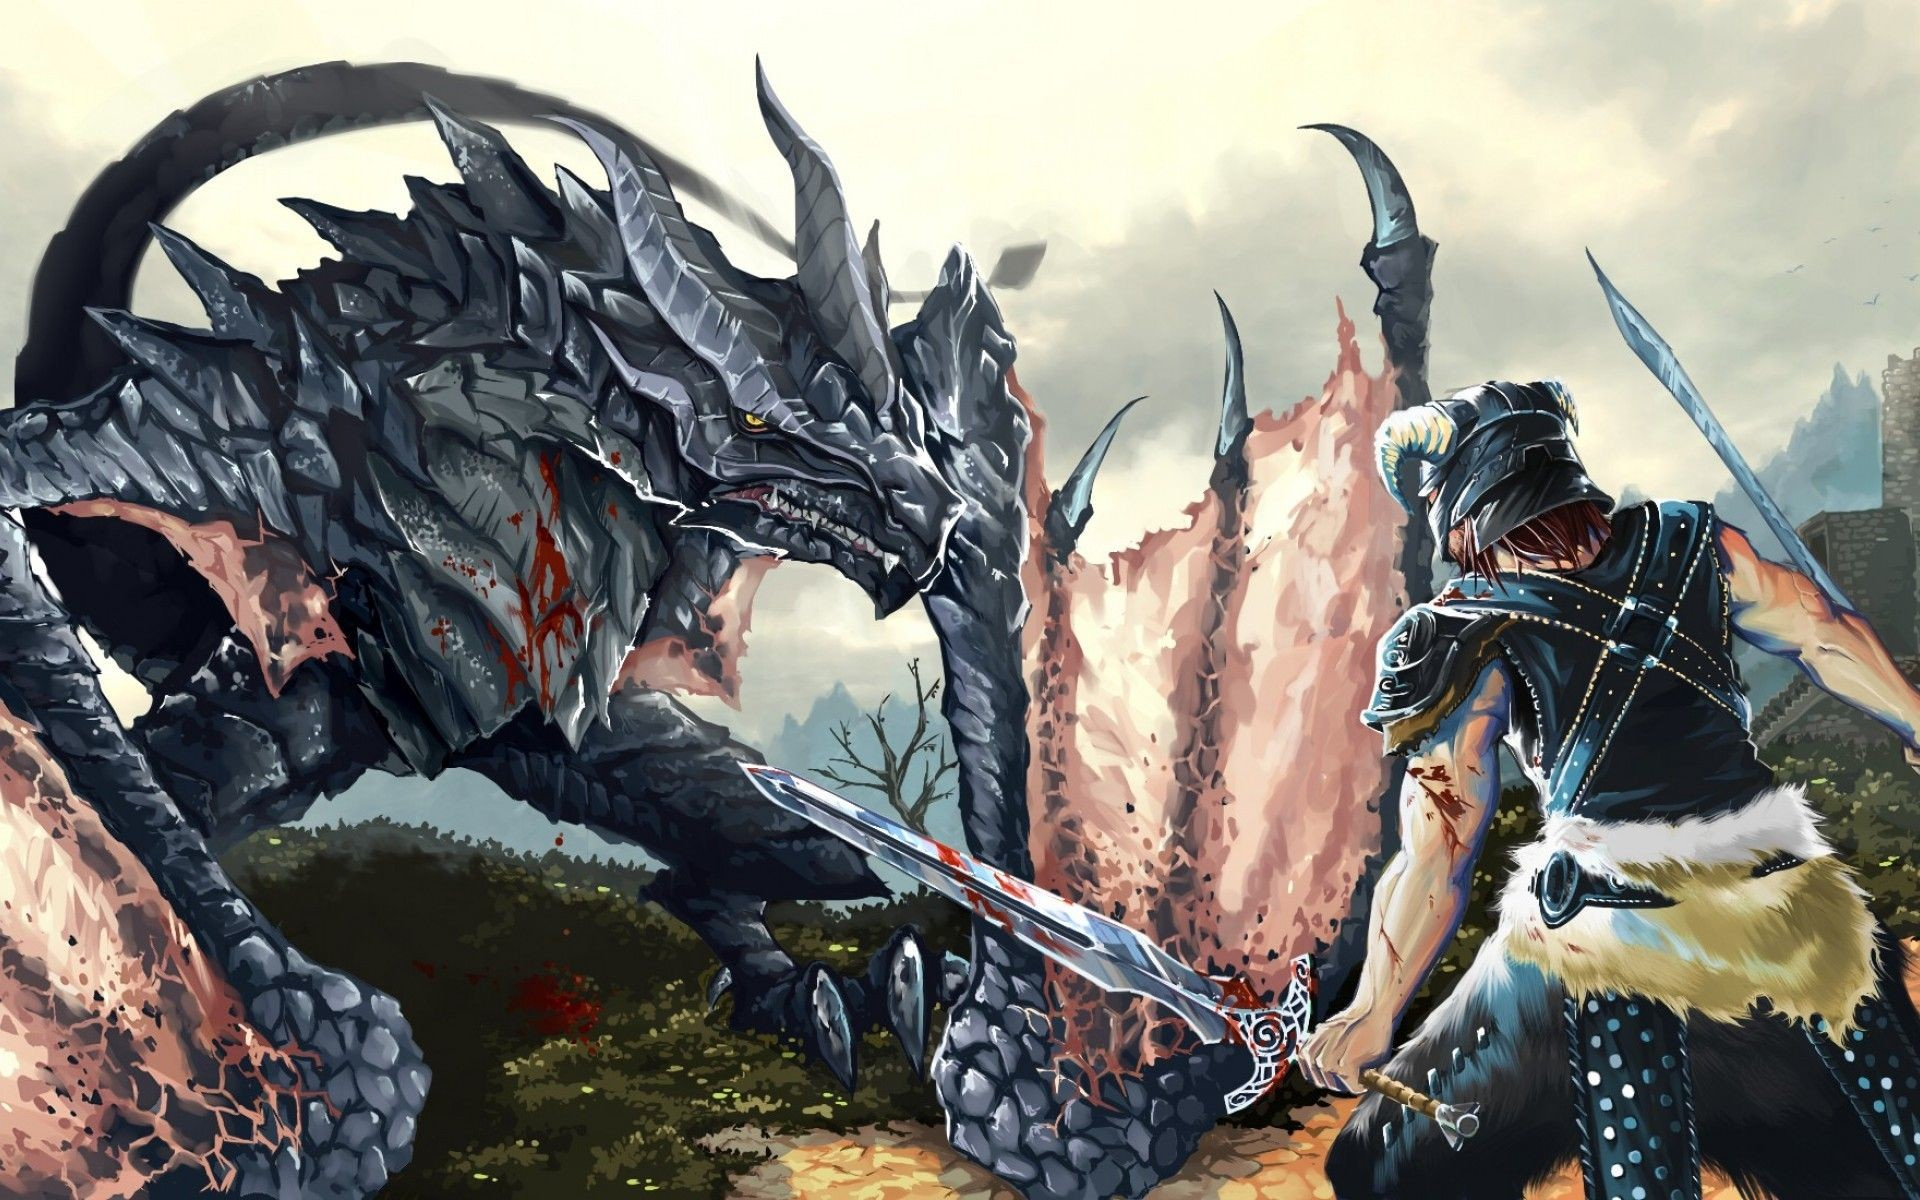 … Skyrim Dragon Hd Wallpaper 1920×1080 Id35096. Download